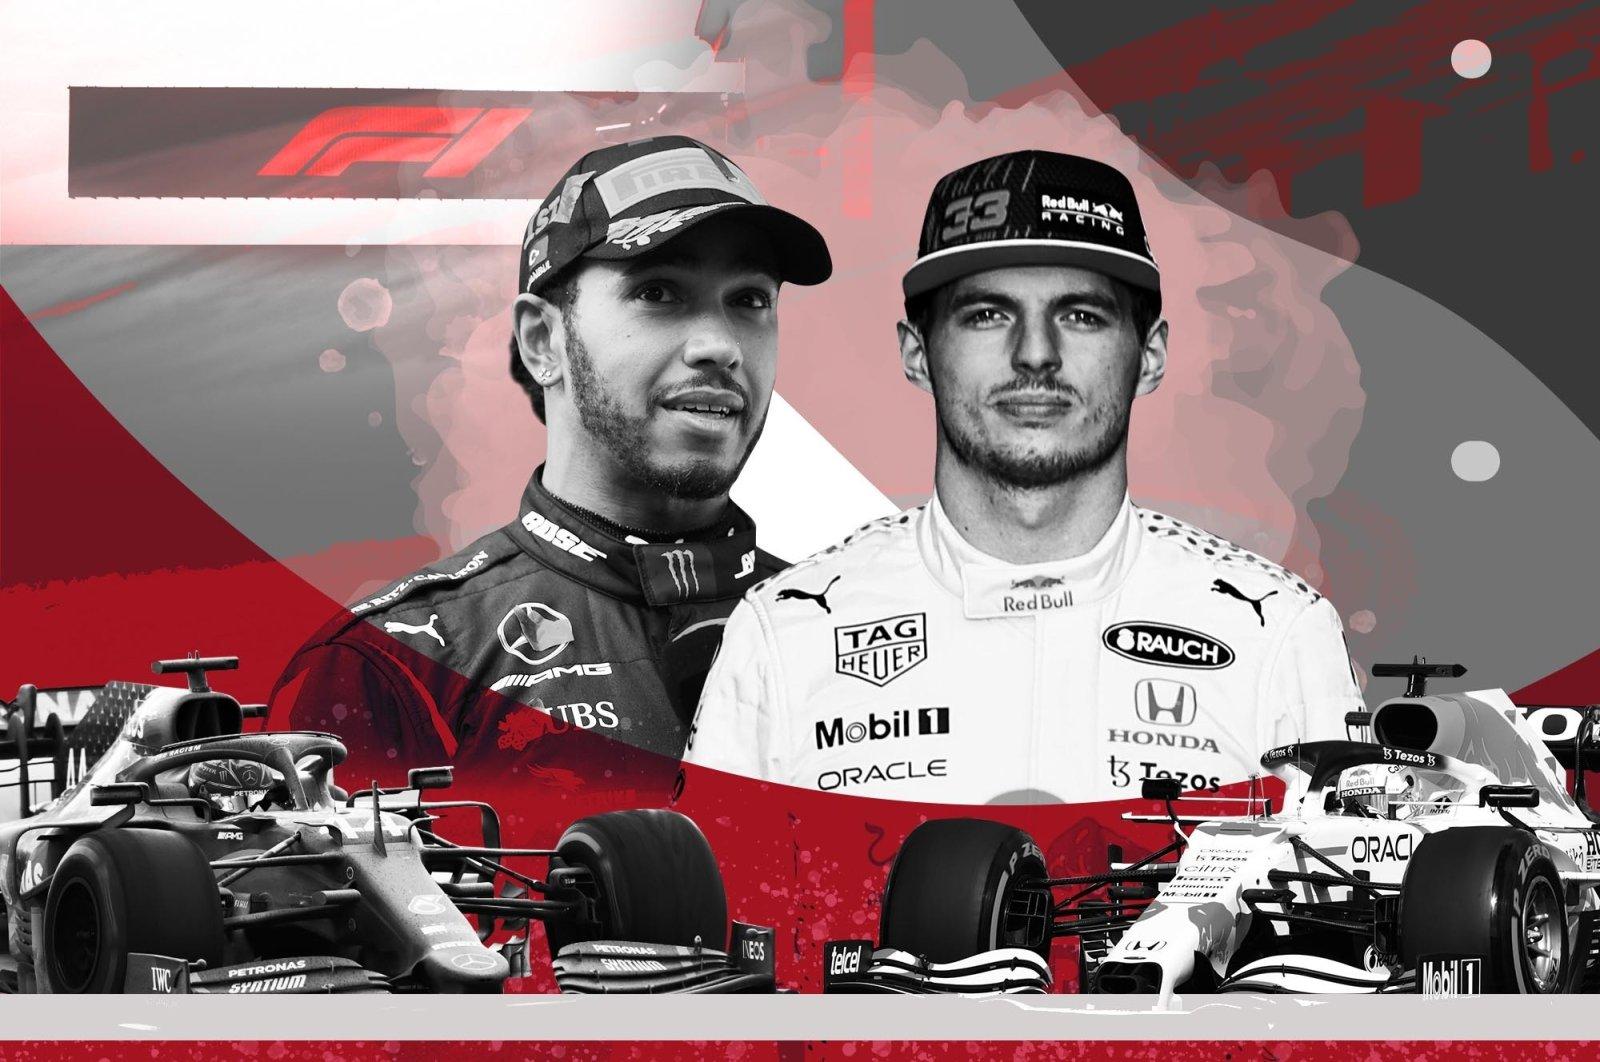 A photo illustration by Daily Sabah's Büşra Öztürk shows Mercedes driver Lewis Hamilton (L) and Red Bull's Max Verstappen. (Büşra Öztürk)